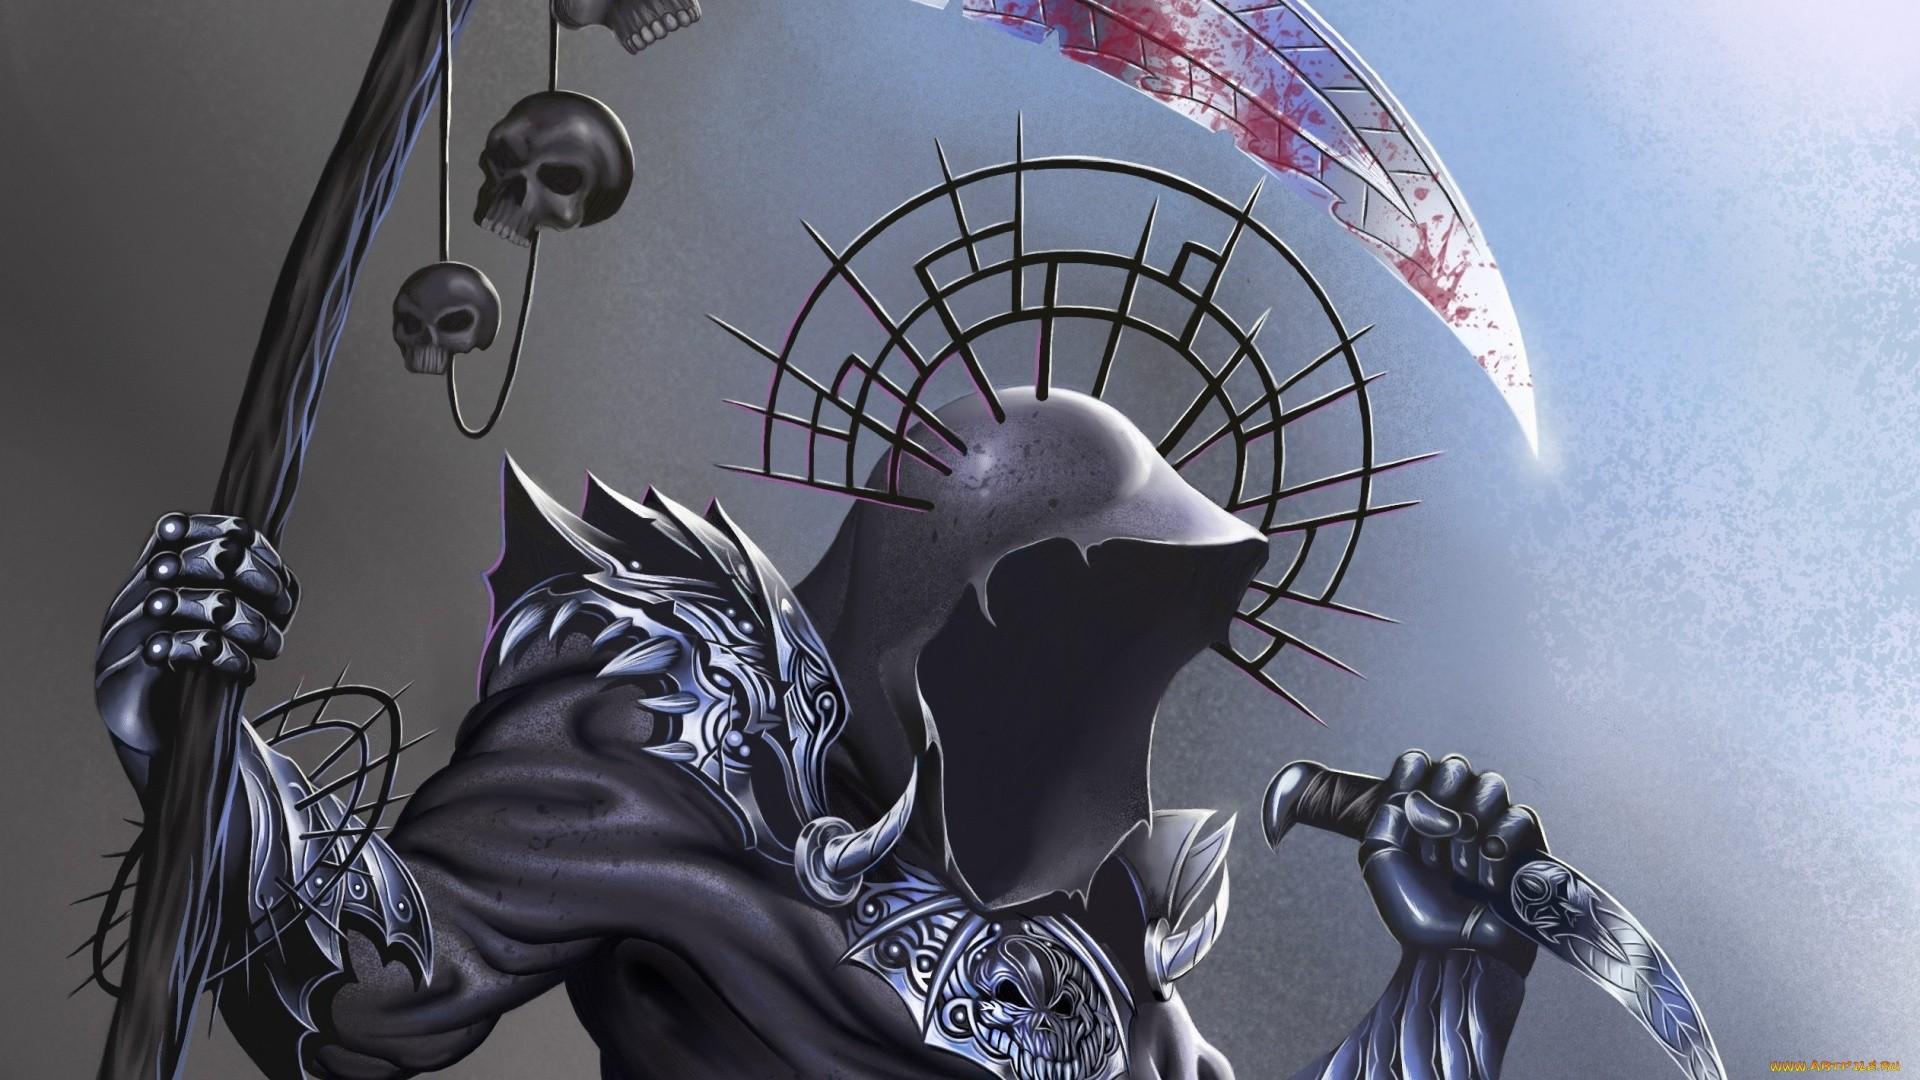 Grim Reaper HD Wallpaper